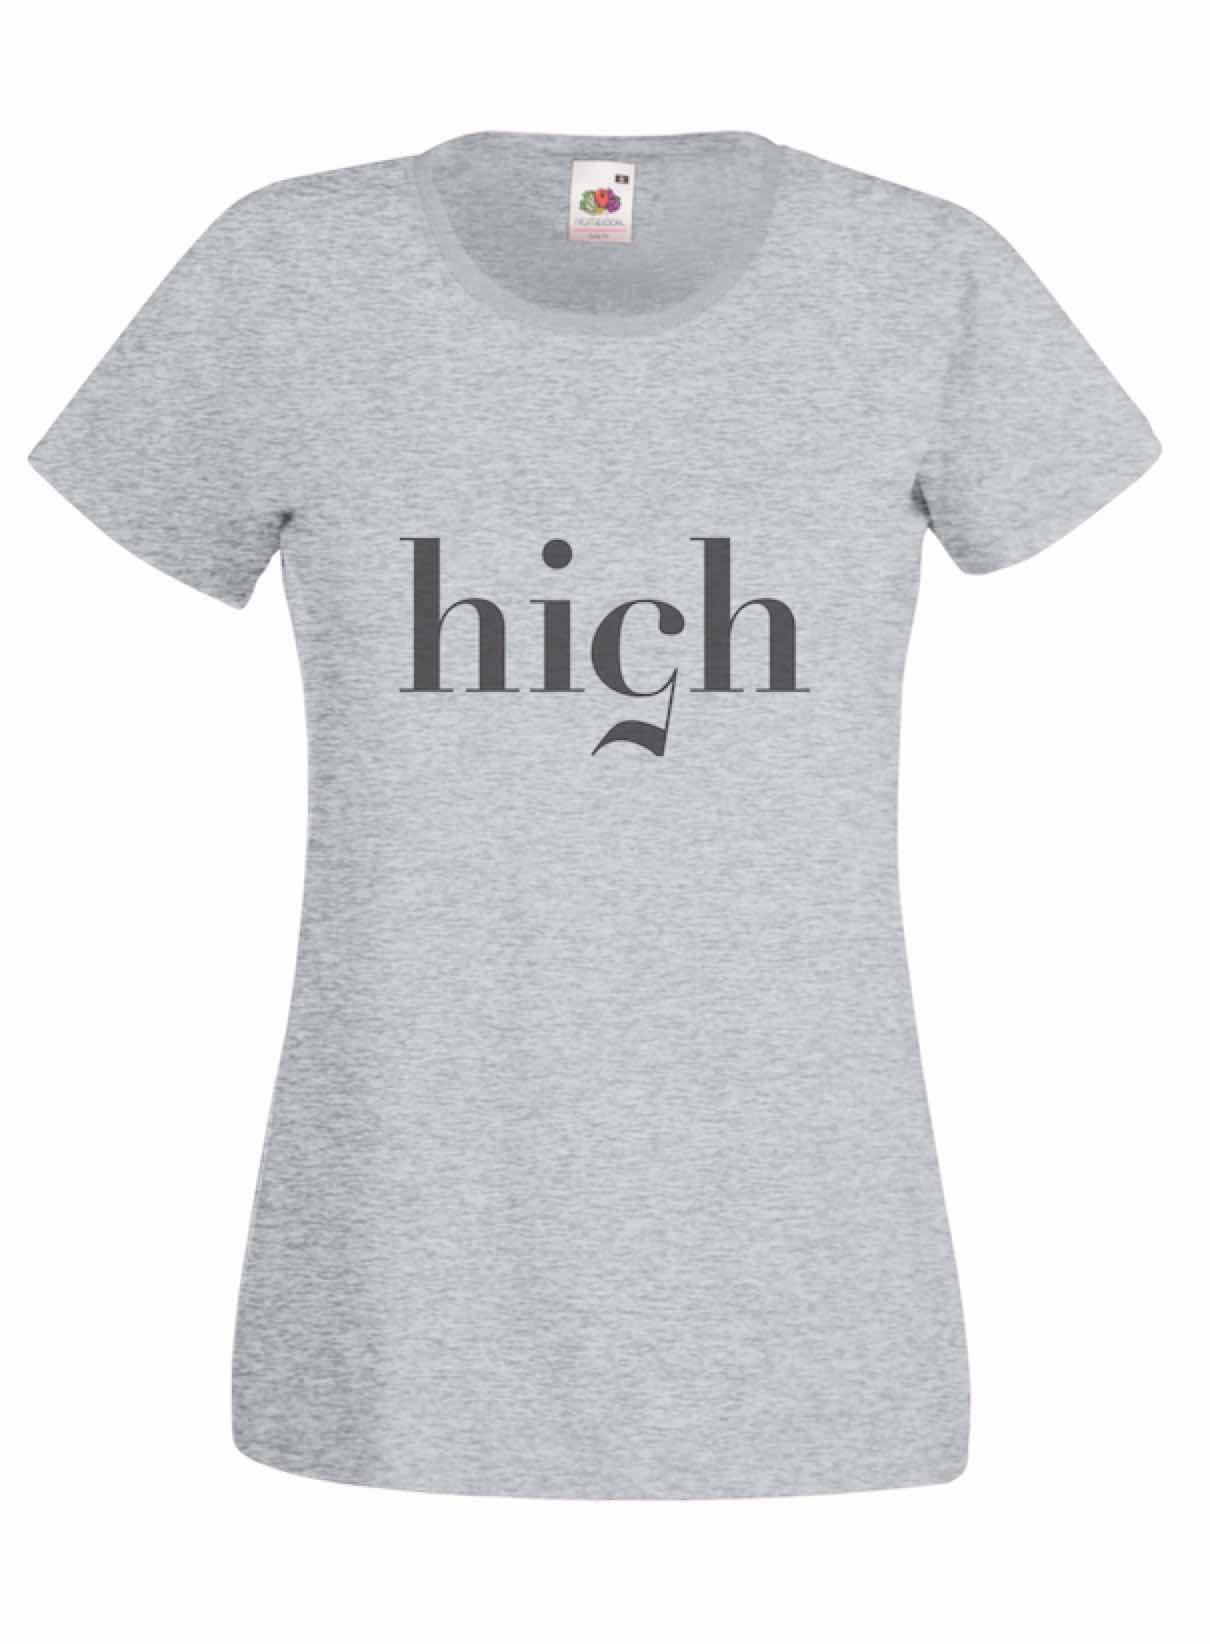 High 5 design for t-shirt, hoodie & sweatshirt